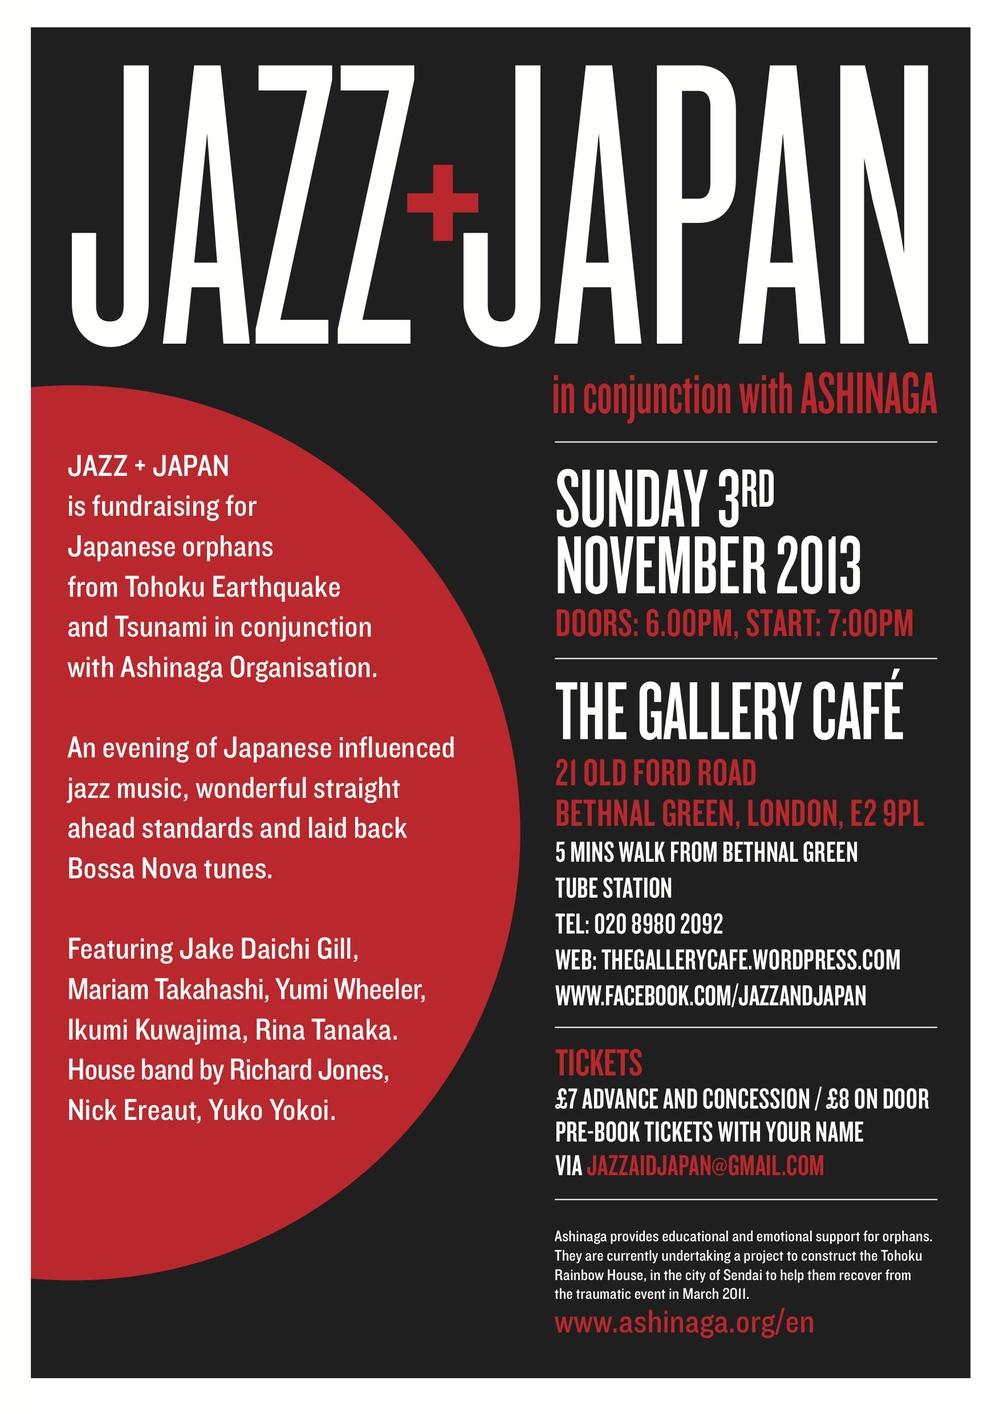 jazz+japan 13 jpg